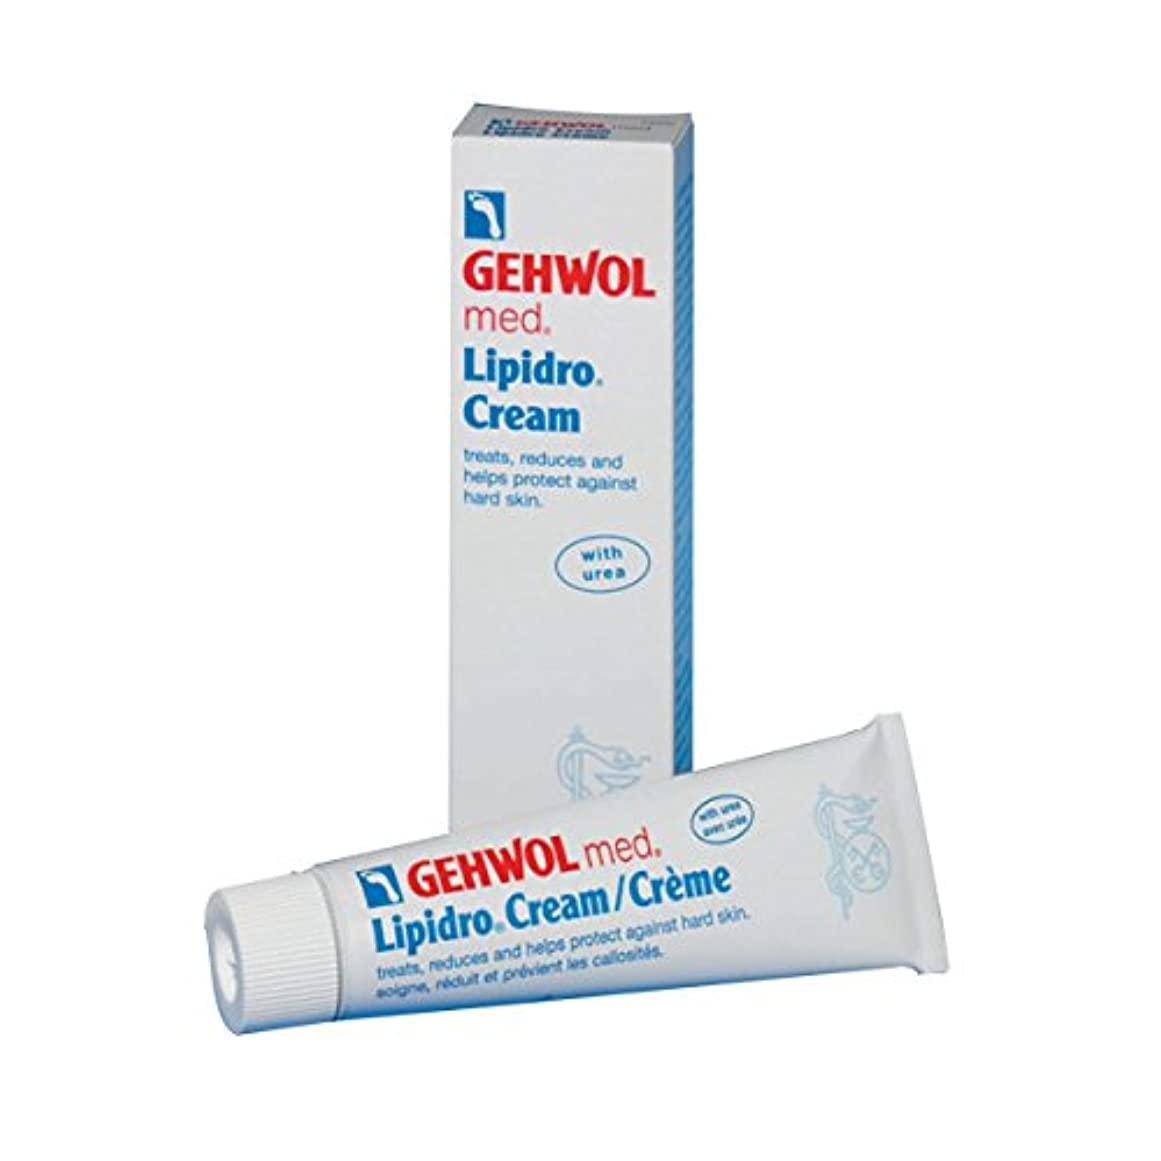 難民囲い大臣Gehwol Med Lipidro Cream 75ml [並行輸入品]